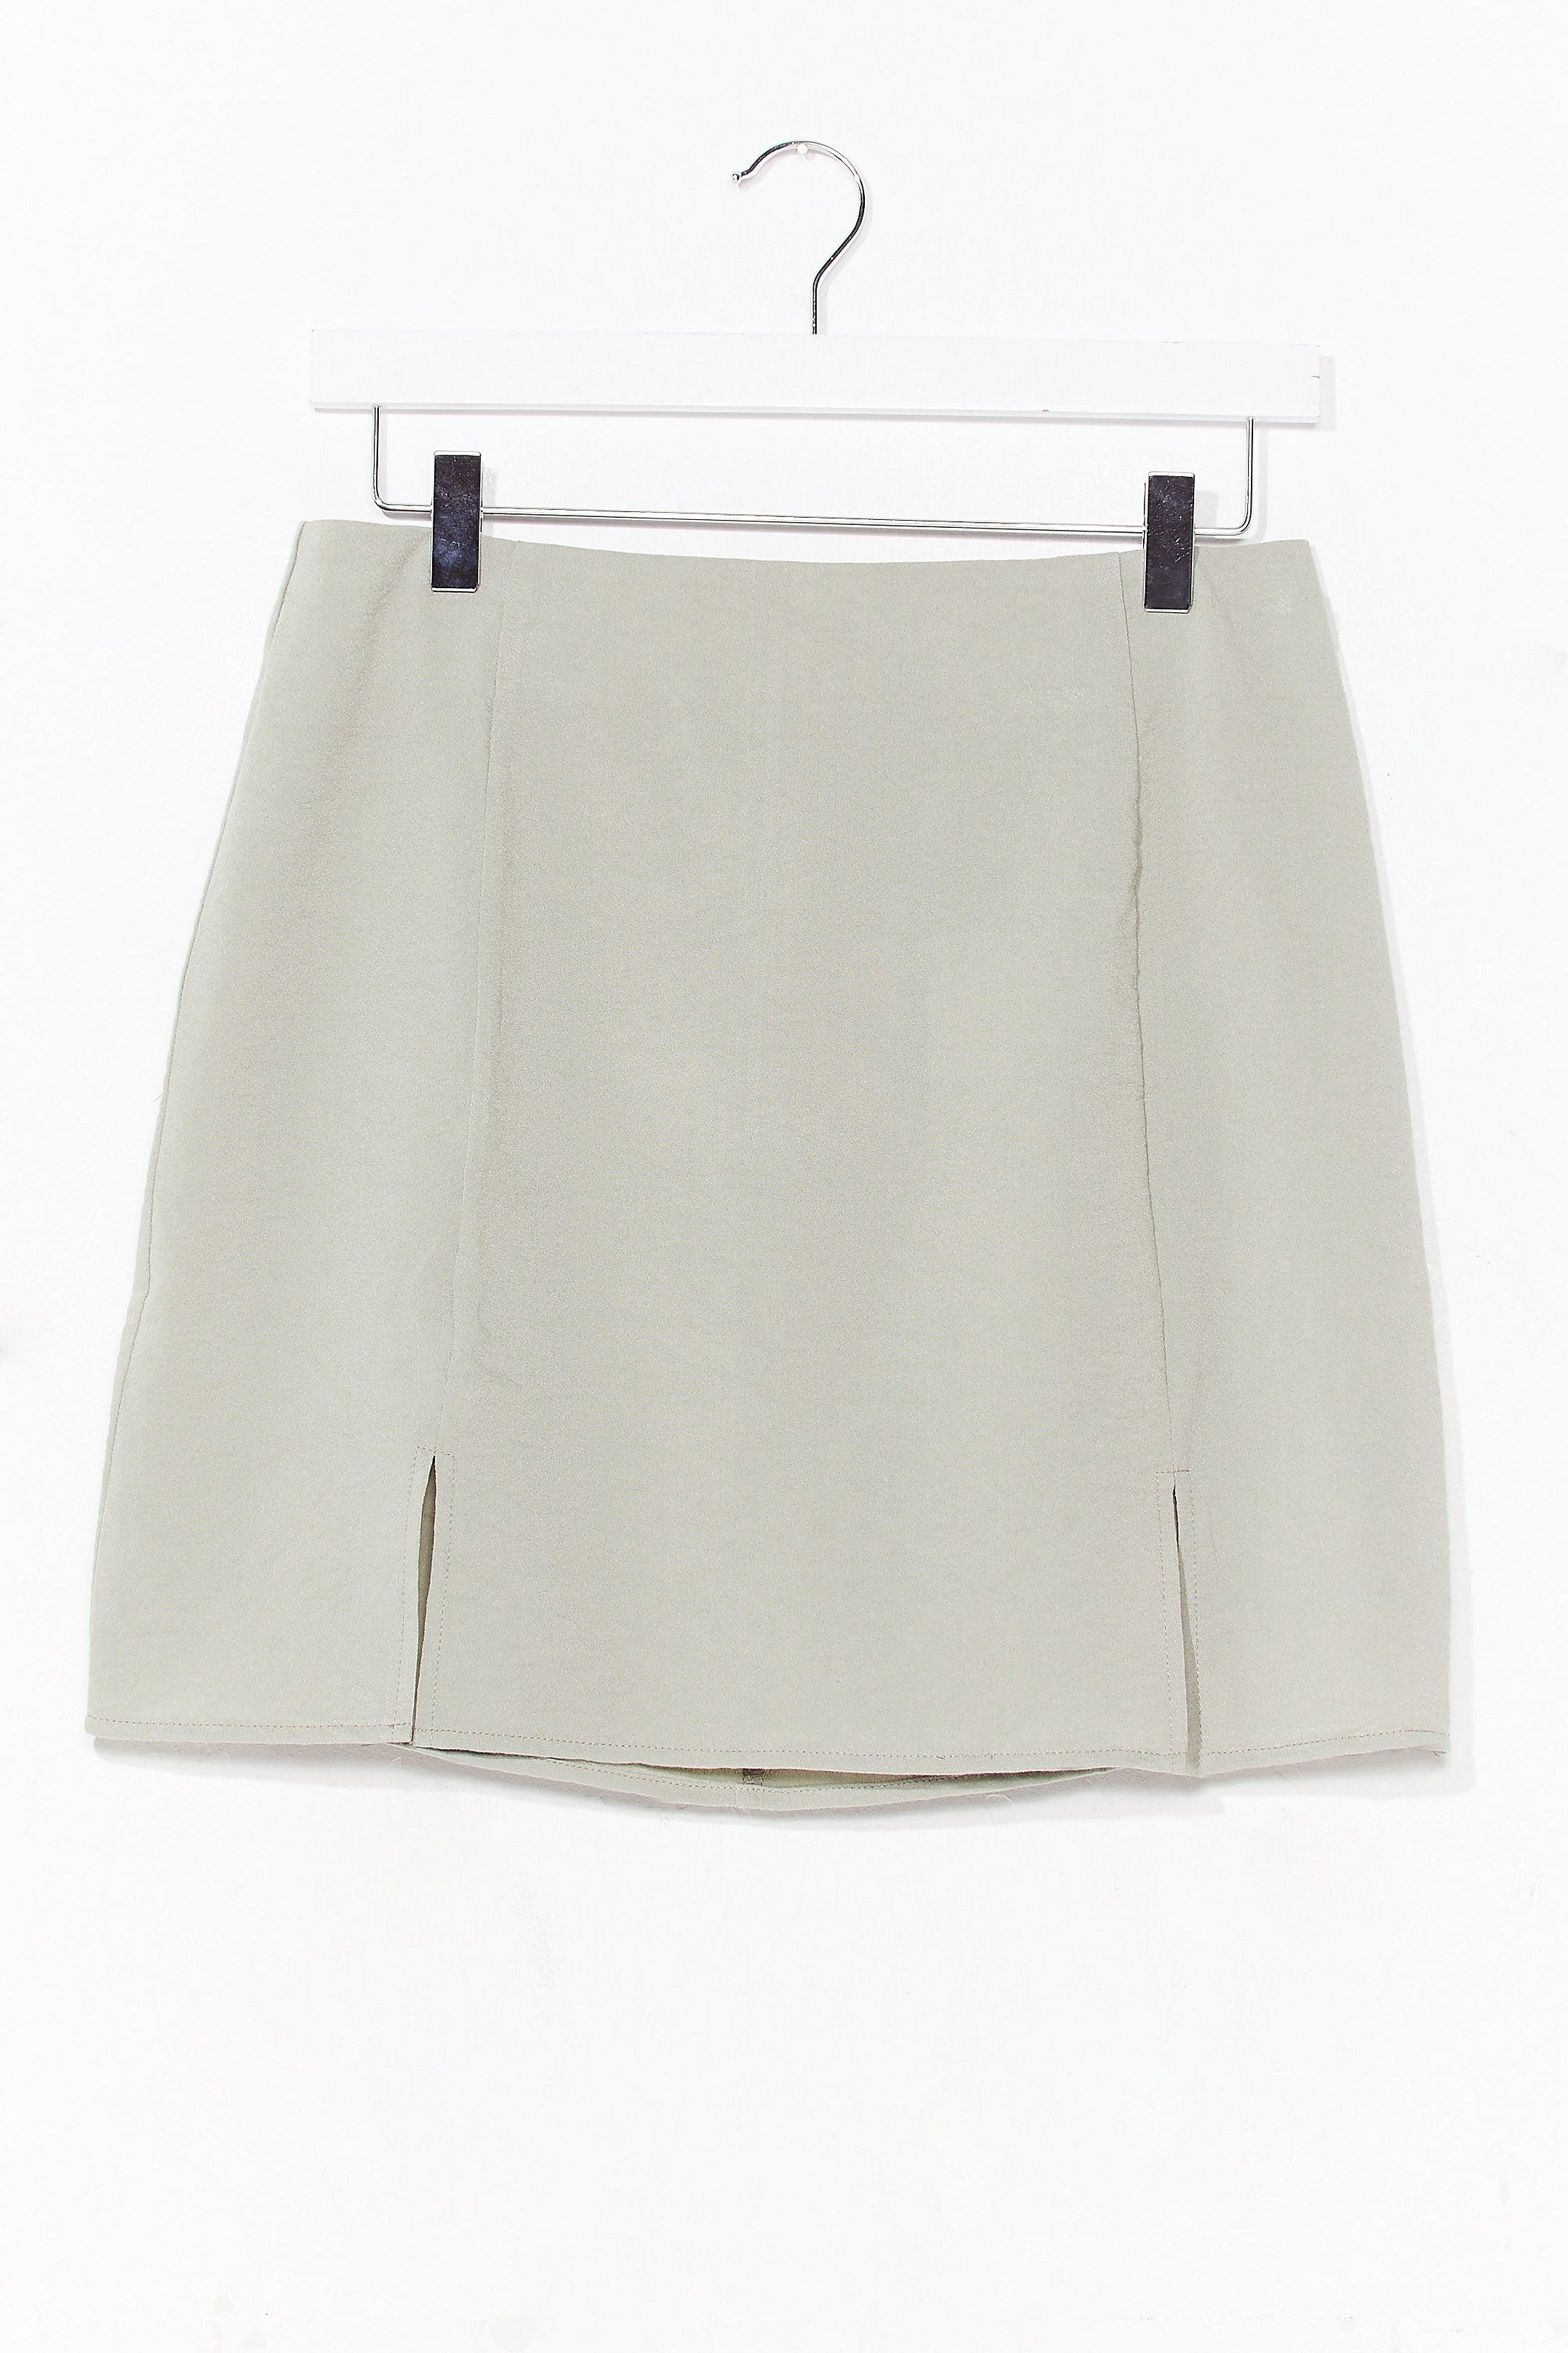 What's Slit Gonna Be High-Waisted Mini Skirt | Nasty Gal